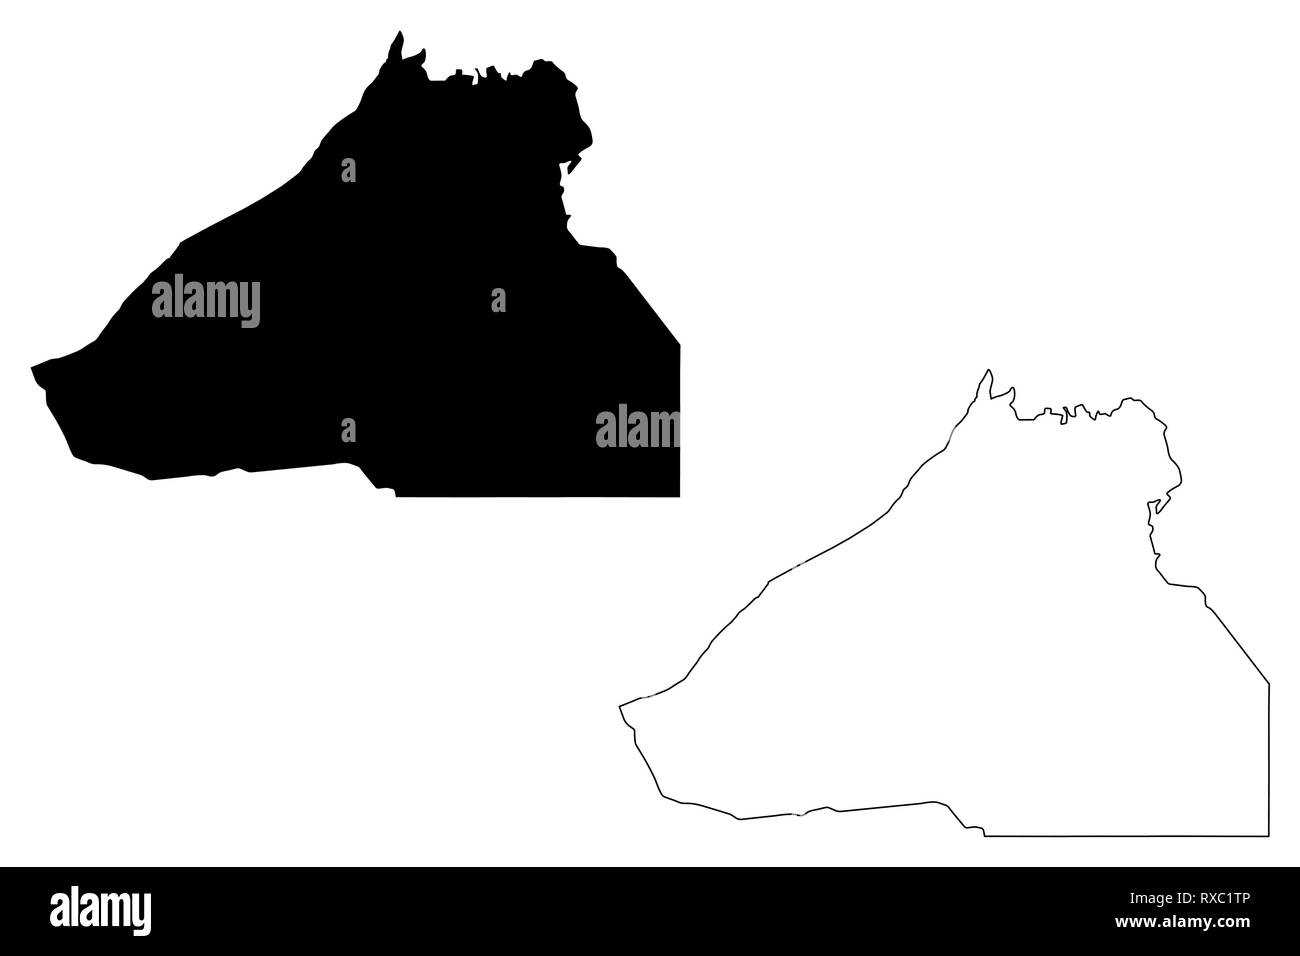 Guelmim-Oued Noun Region (Administrative divisions of Morocco, Kingdom of Morocco, Regions of Morocco) map vector illustration, scribble sketch Guelmi - Stock Image